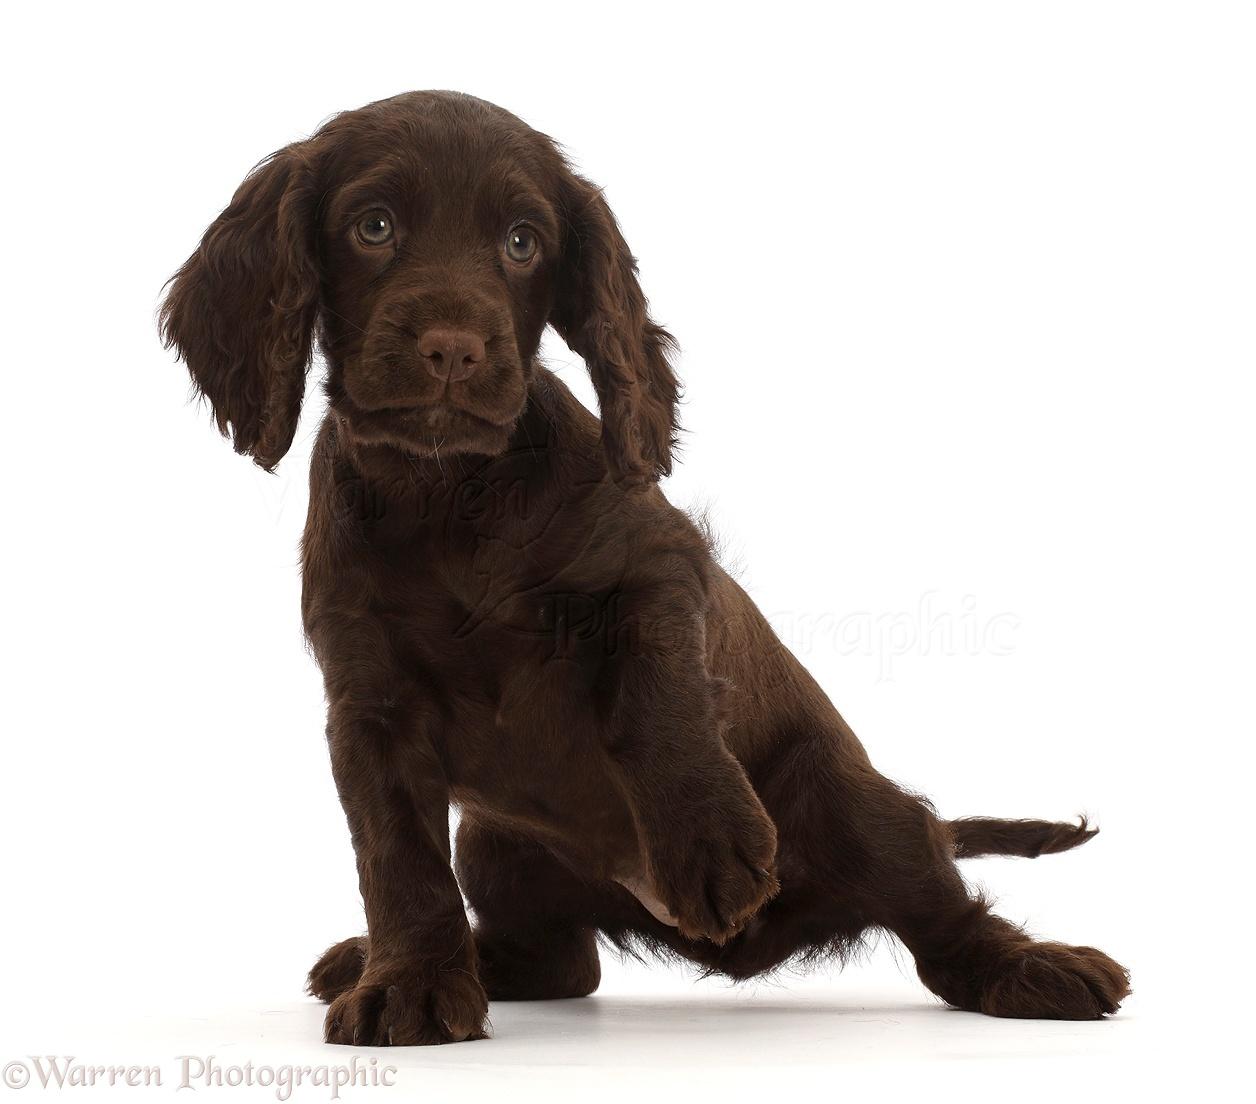 Dog Chocolate Cocker Spaniel Puppy Photo Wp45920